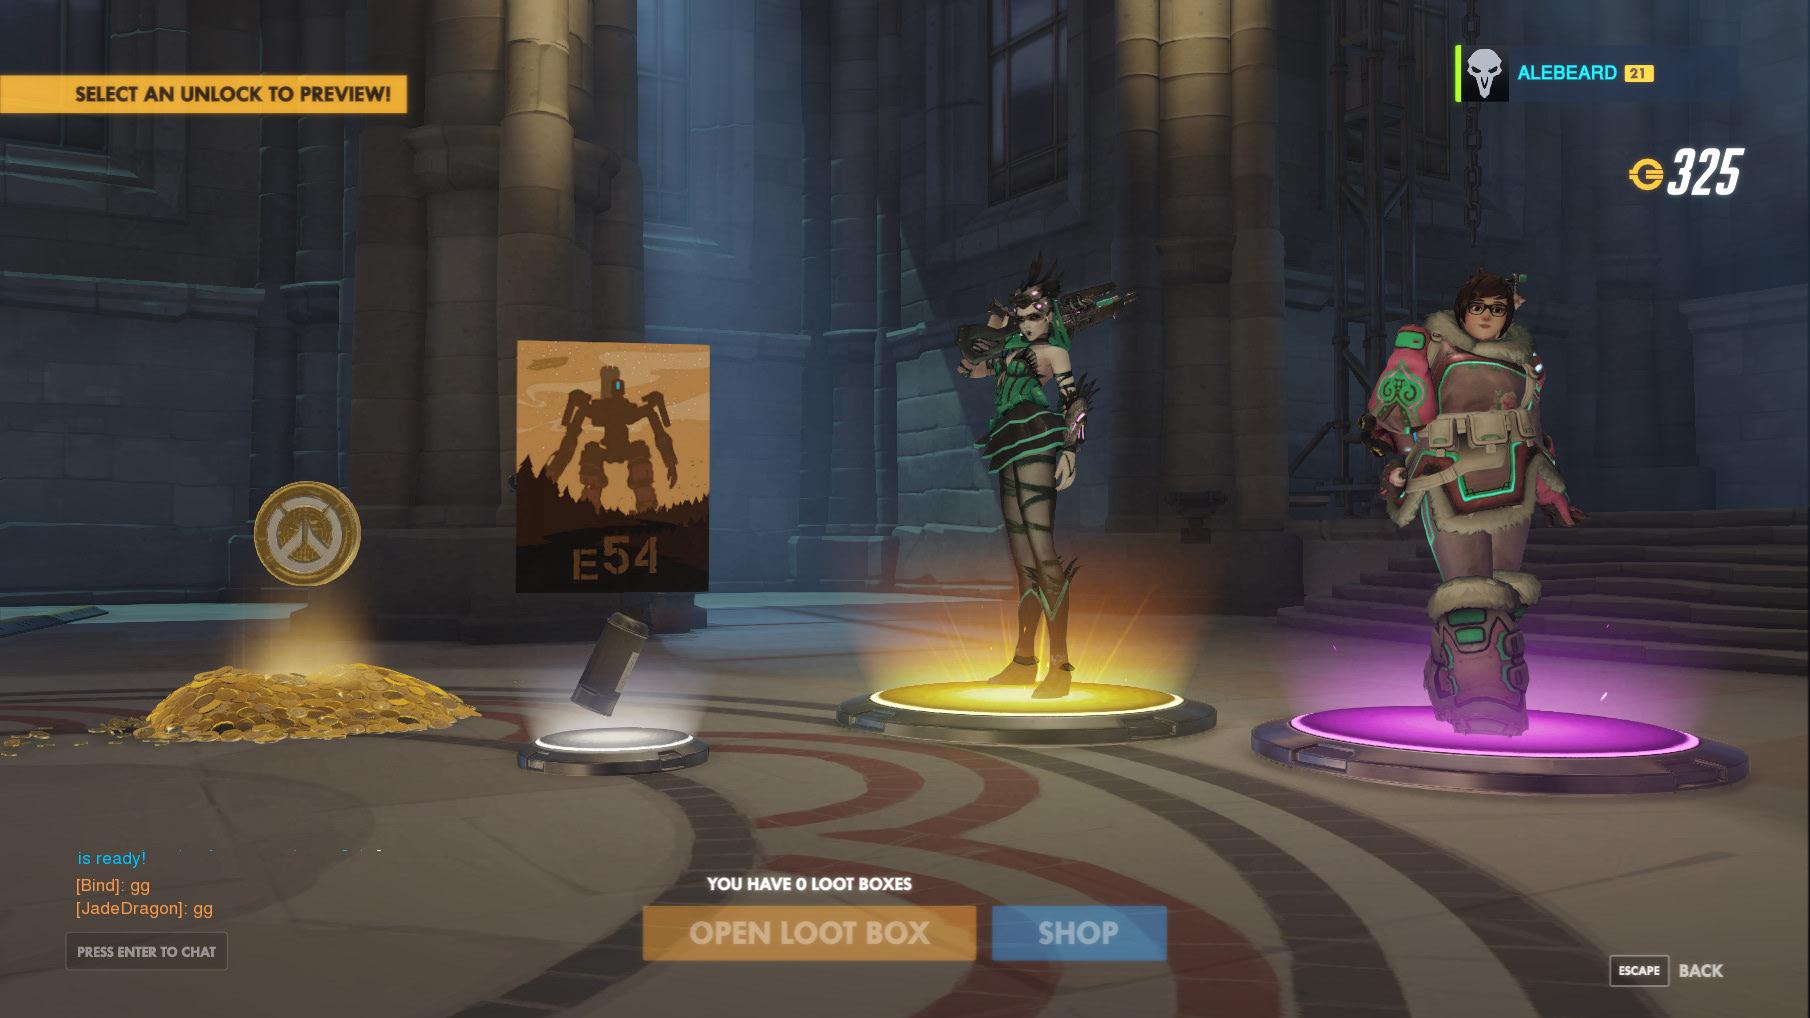 2x Overwatch Loot Box [Gift link | Battle.net] 2019